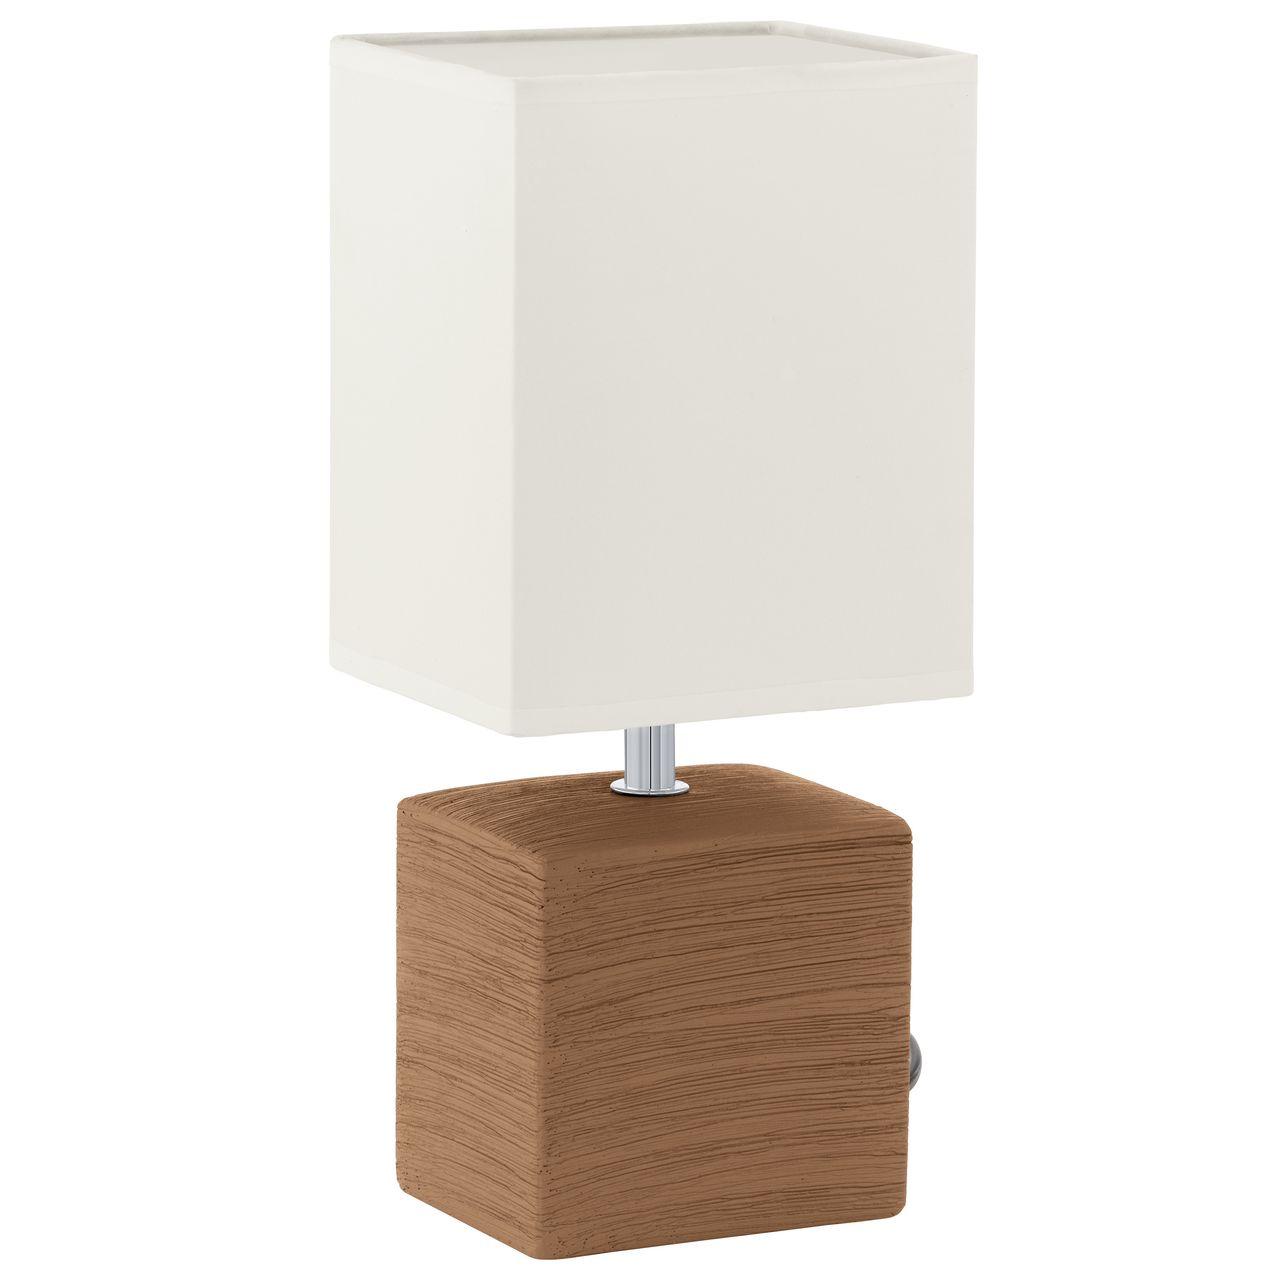 Настольная лампа Eglo Mataro 93045 eglo настольная лампа eglo trungle 49624